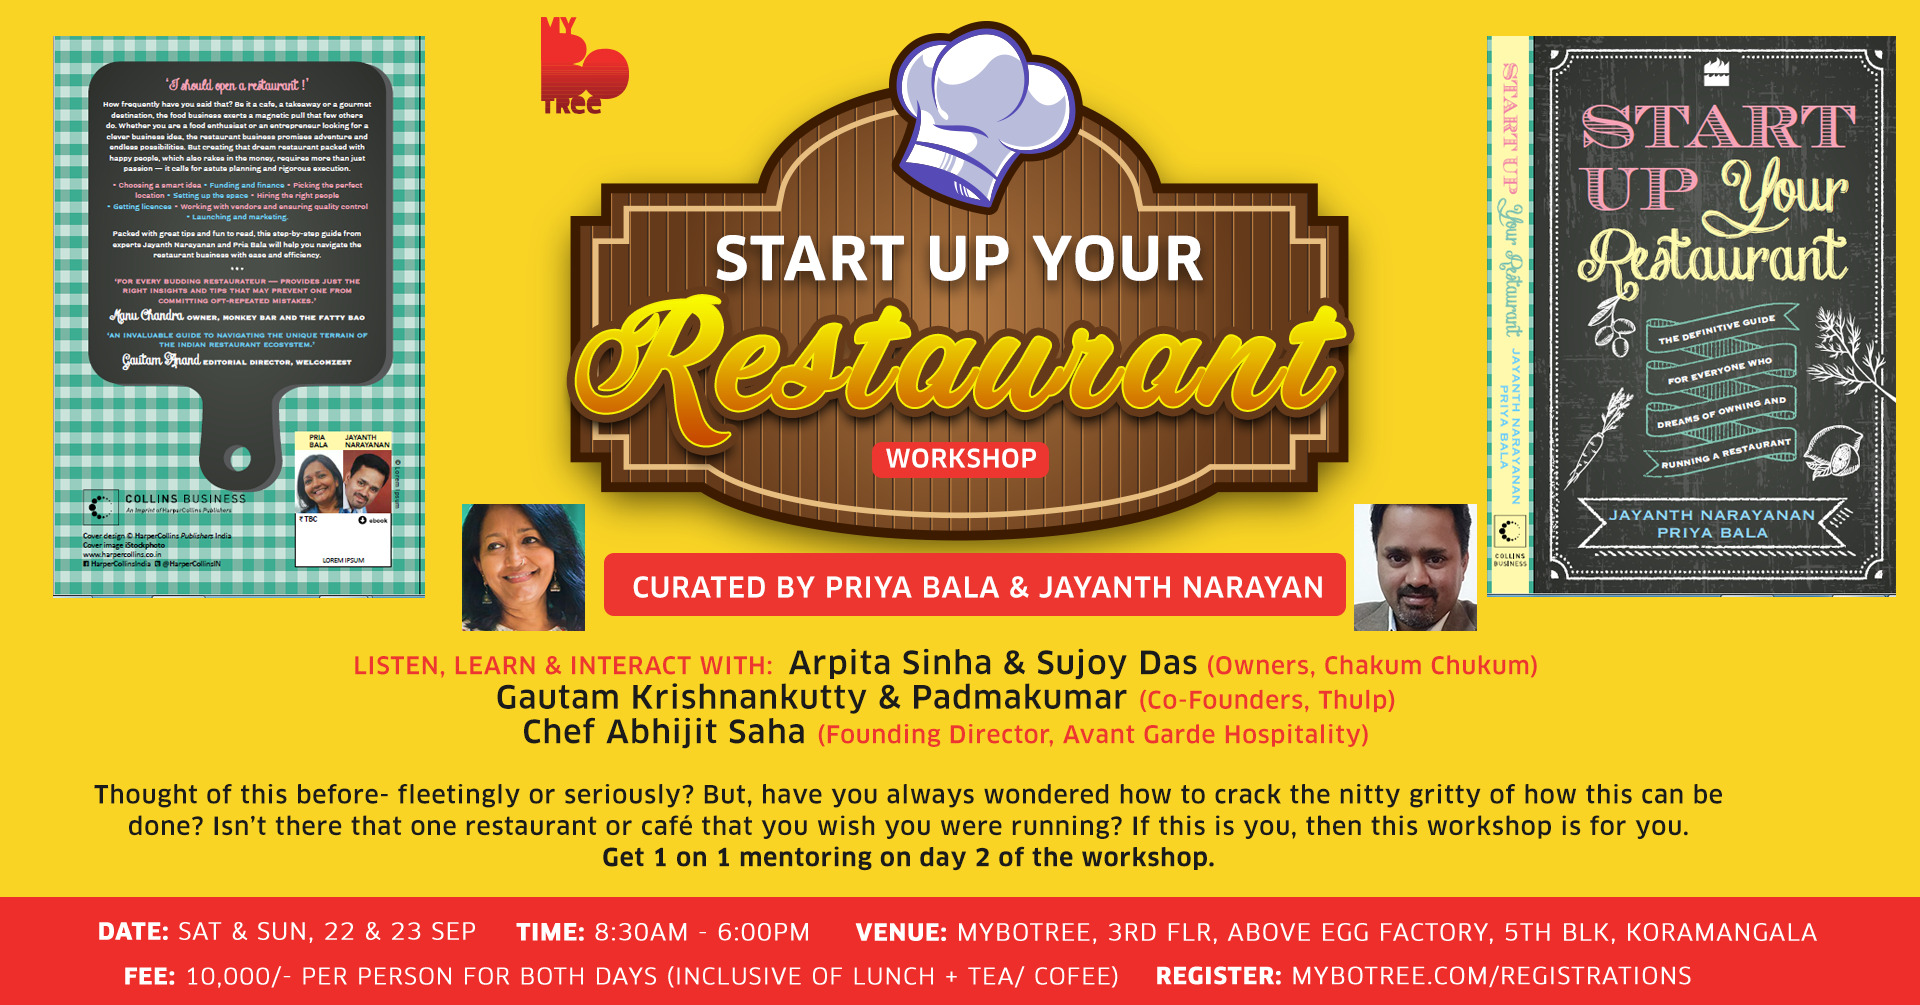 Start up Your Restaurant